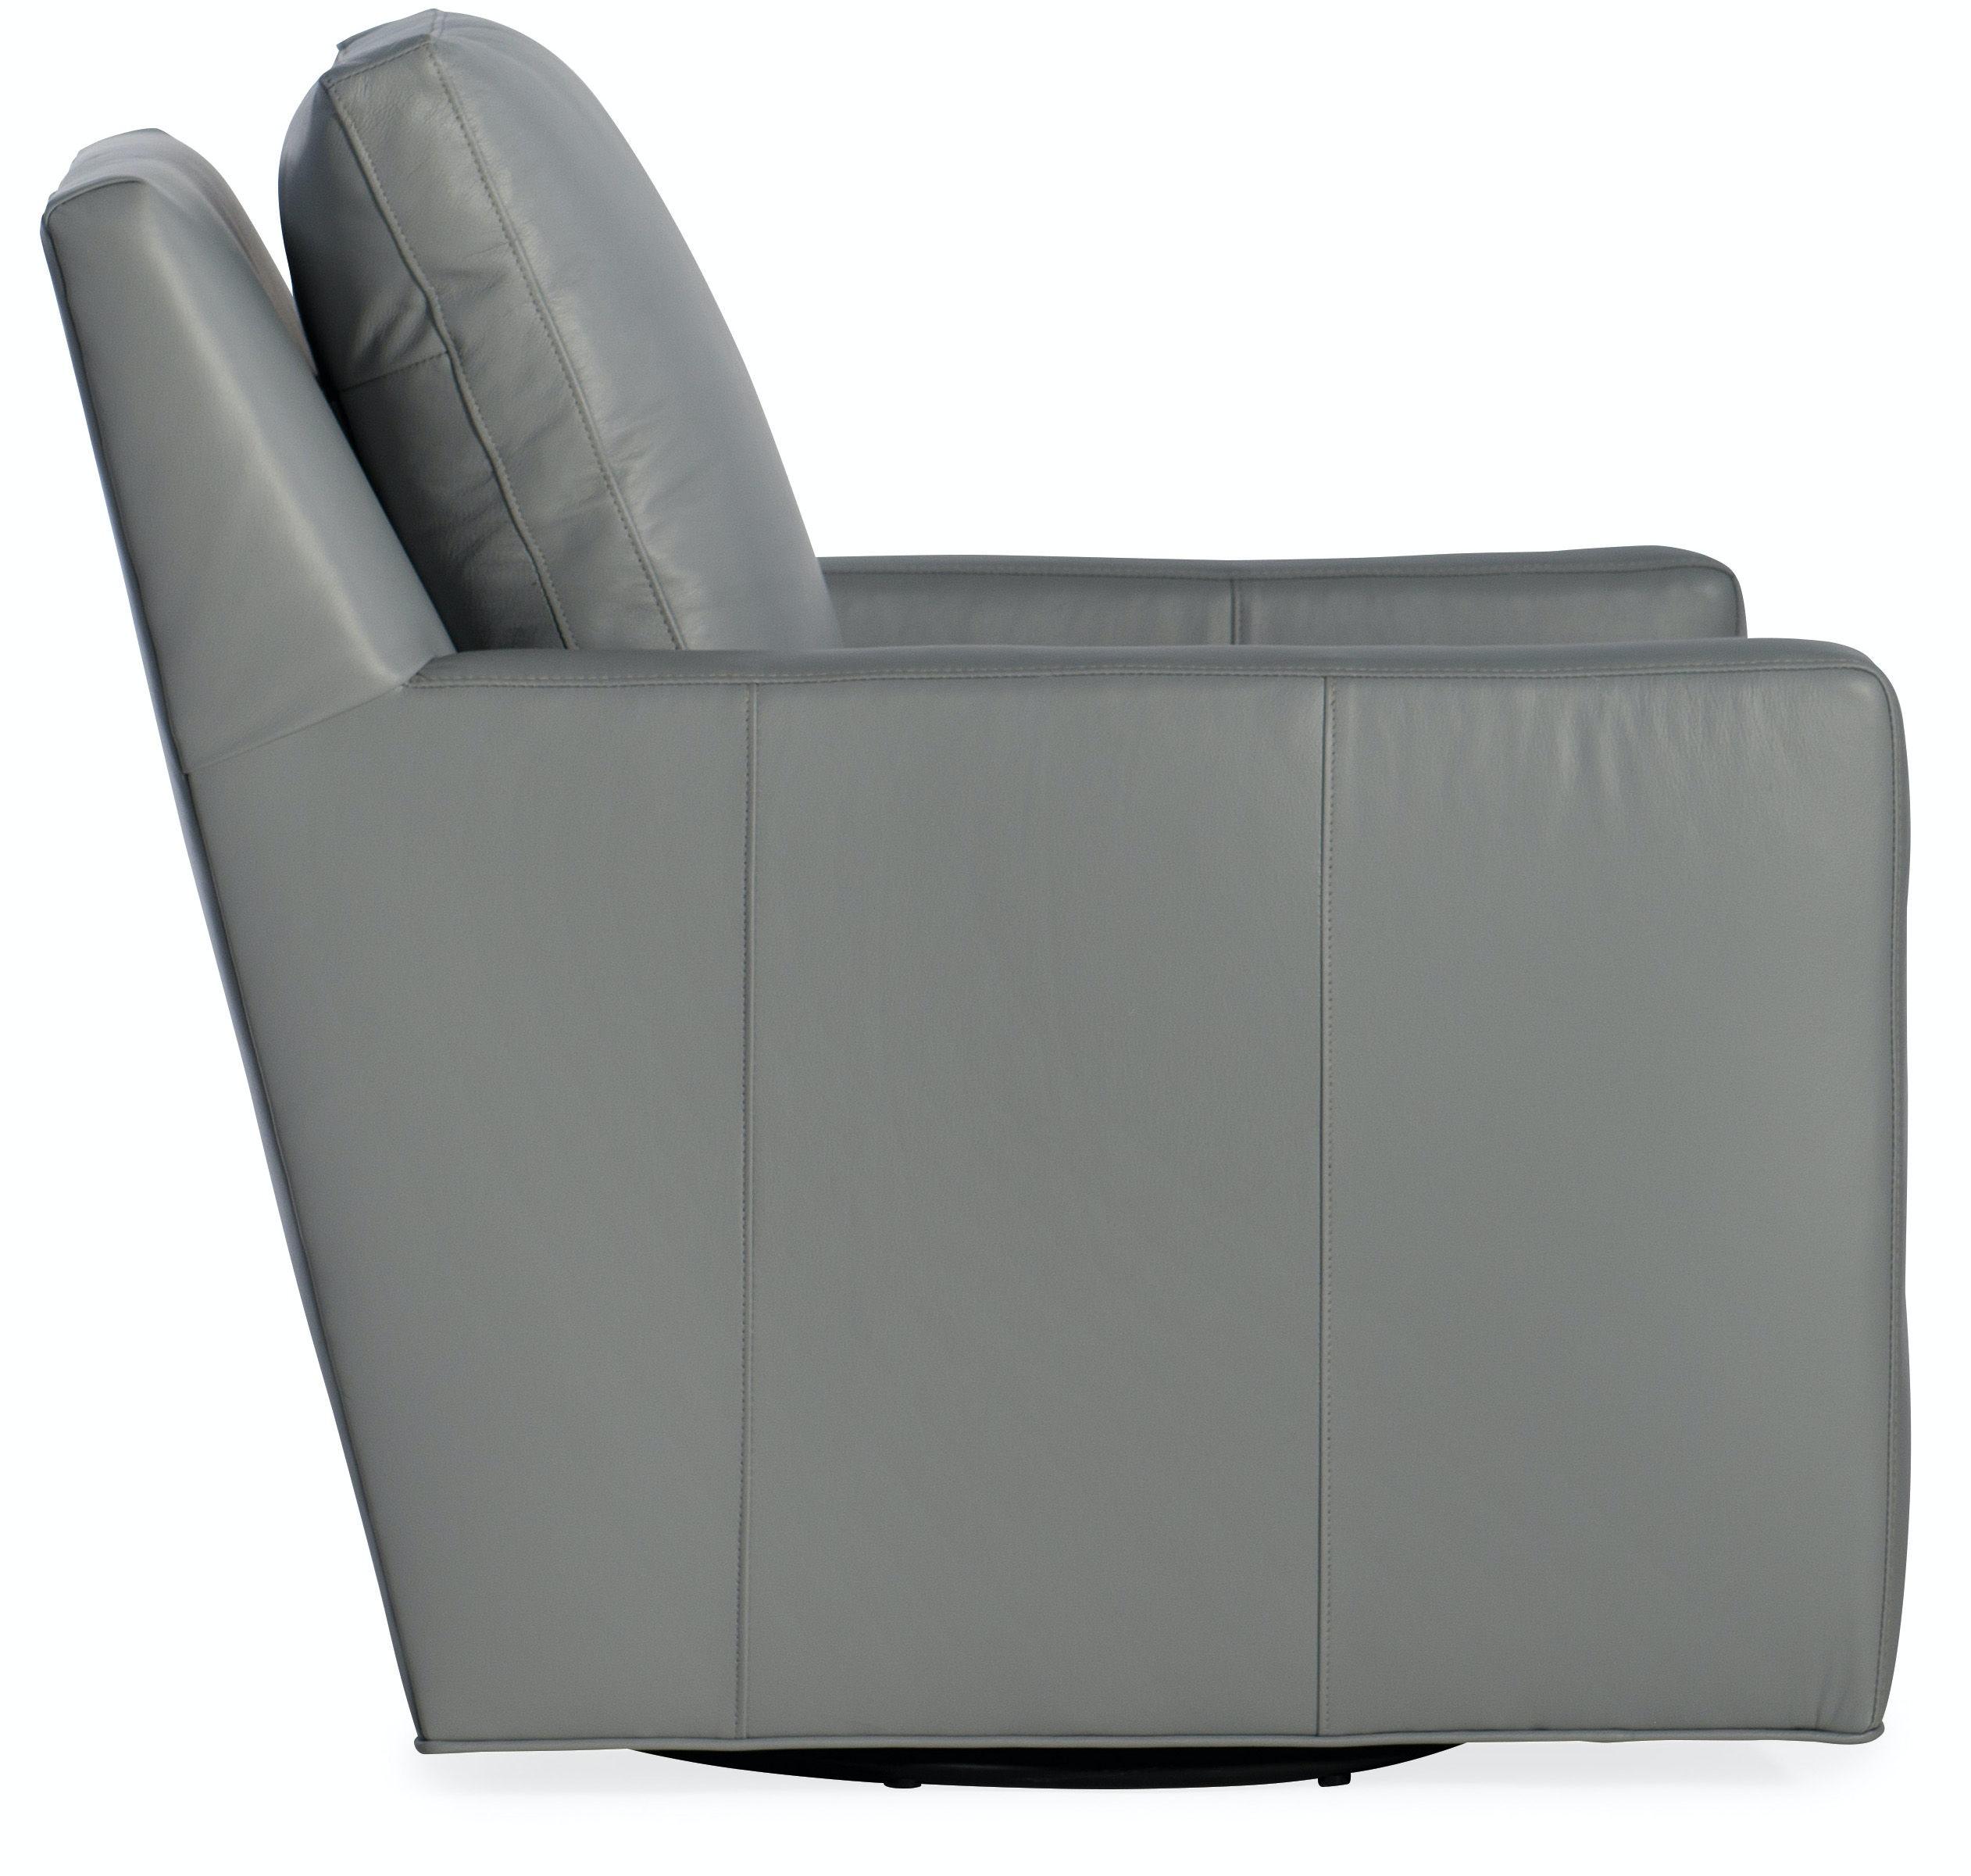 swivel tub chairs land of nod high chair jaxon 8 way tie yo32125sw bradington young from walter e